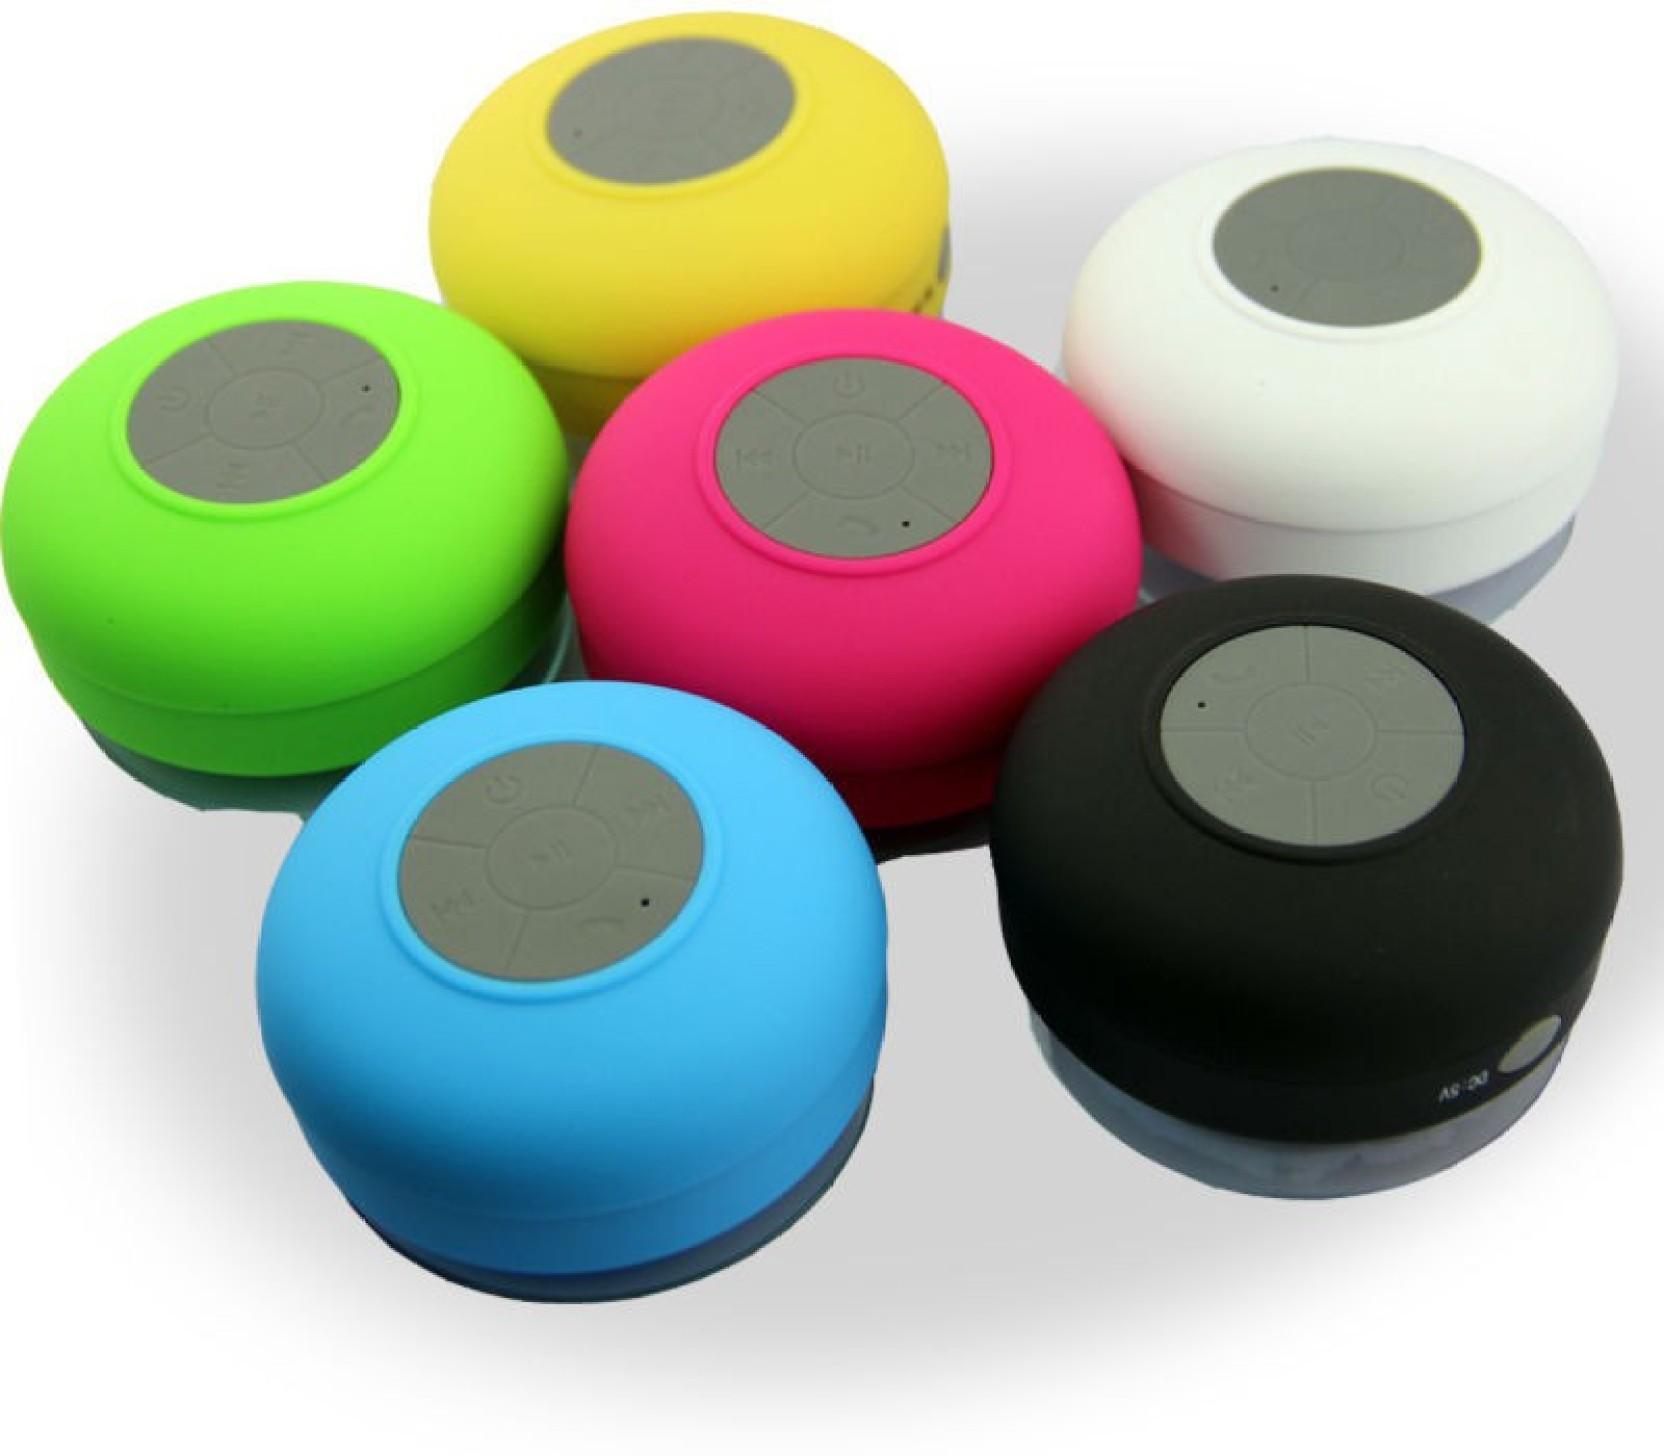 Buy Giztech Waterproof Bluetooth Speaker For Samsung Galaxy Core Bts 06 Original Portable Compare